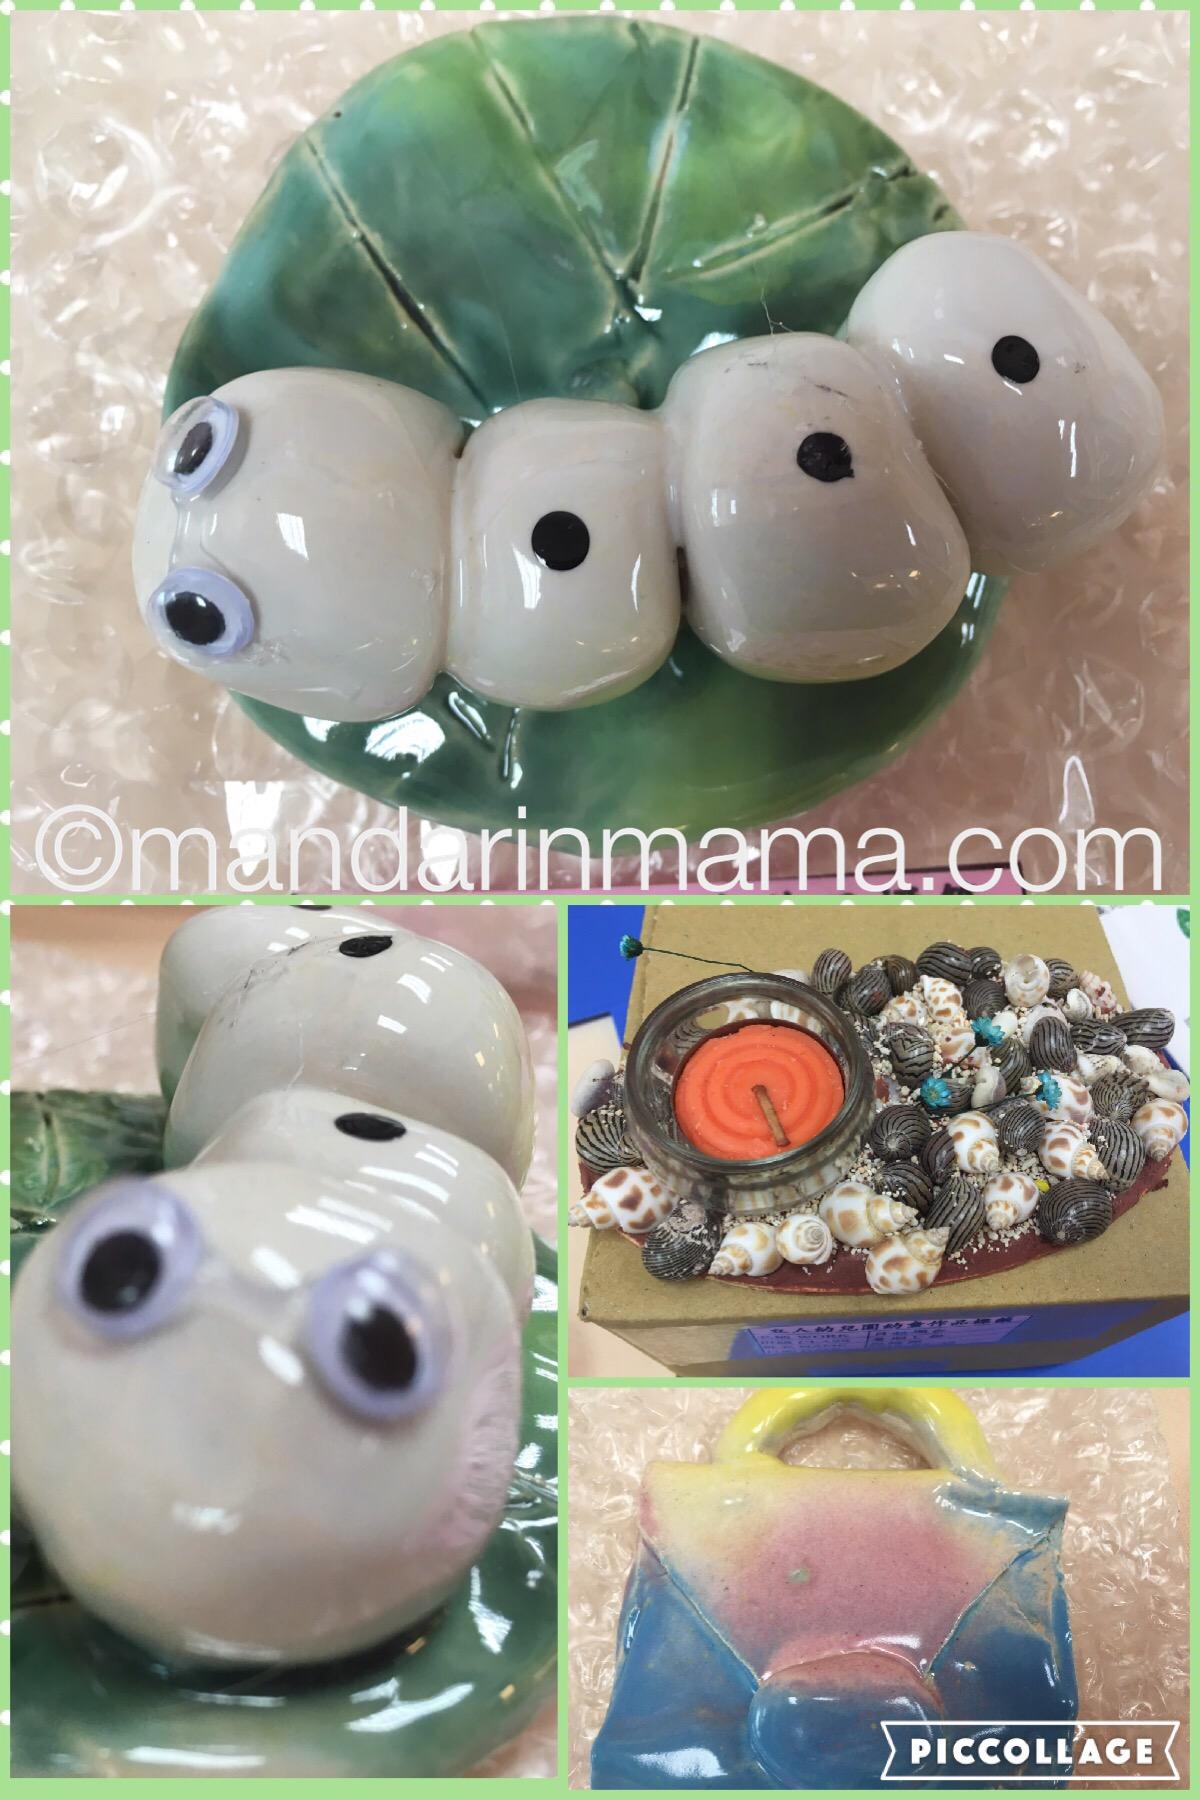 Glow Worm's creations